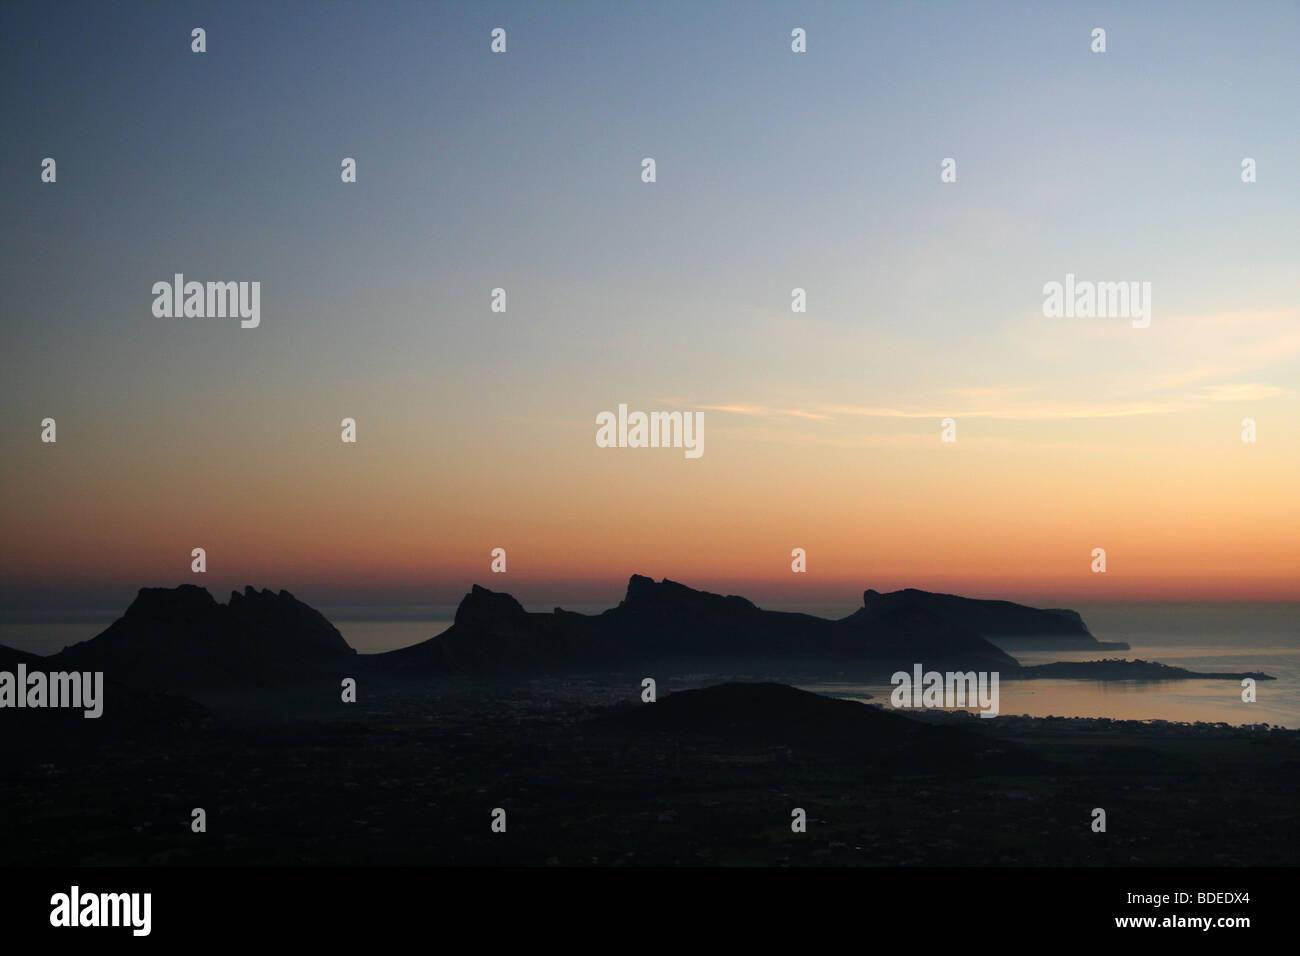 Morning Light on Formentor Coastline Mallorca 01 - Stock Image